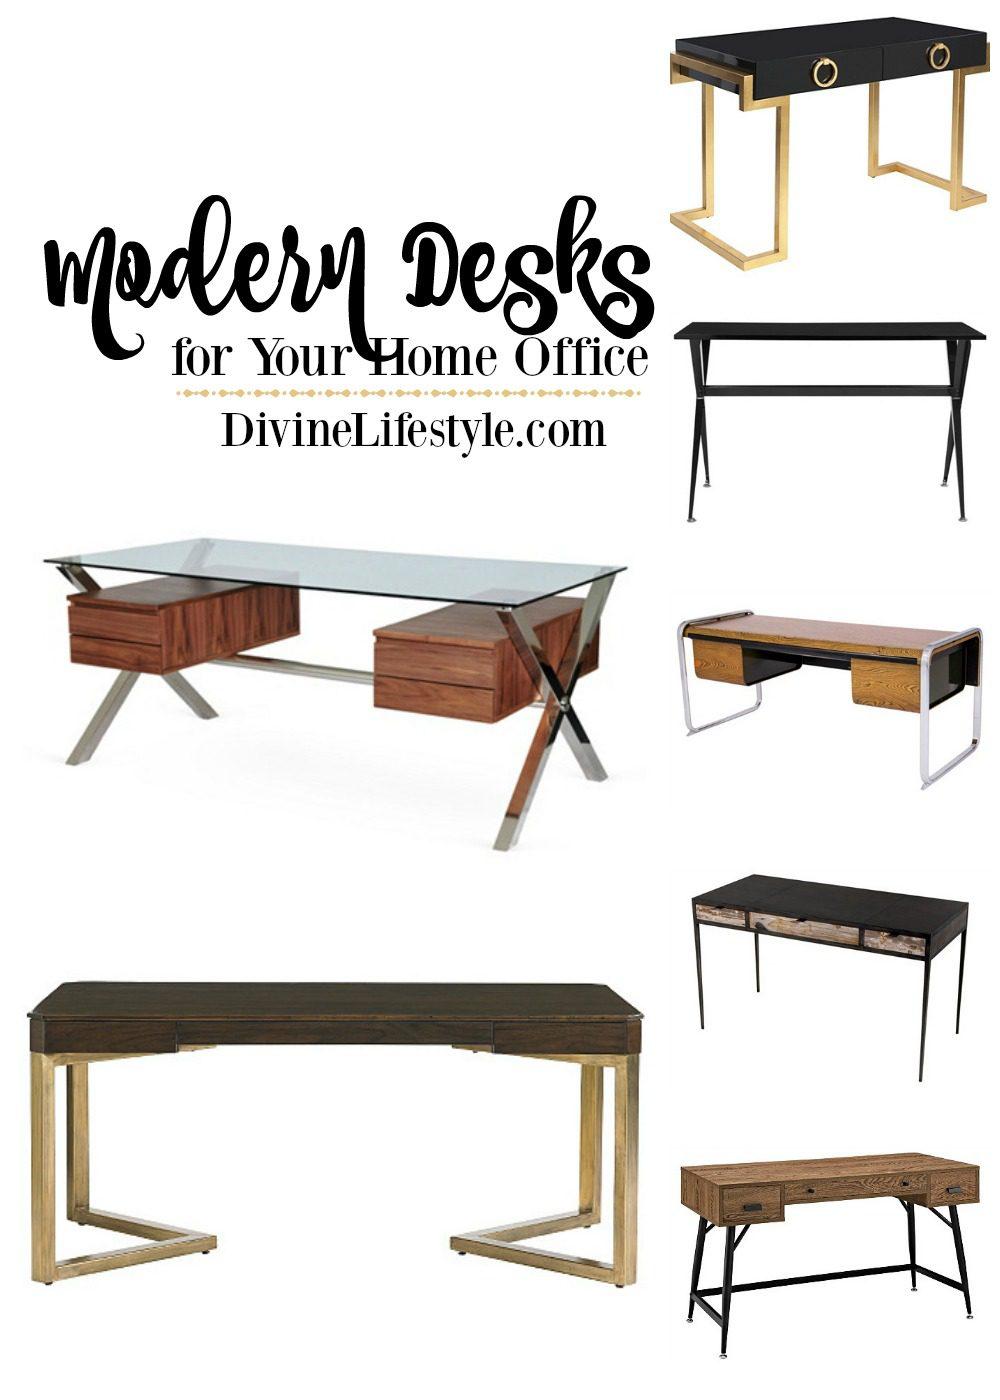 Sleek Modern Desks for the Home Office Design Divine Lifestyle